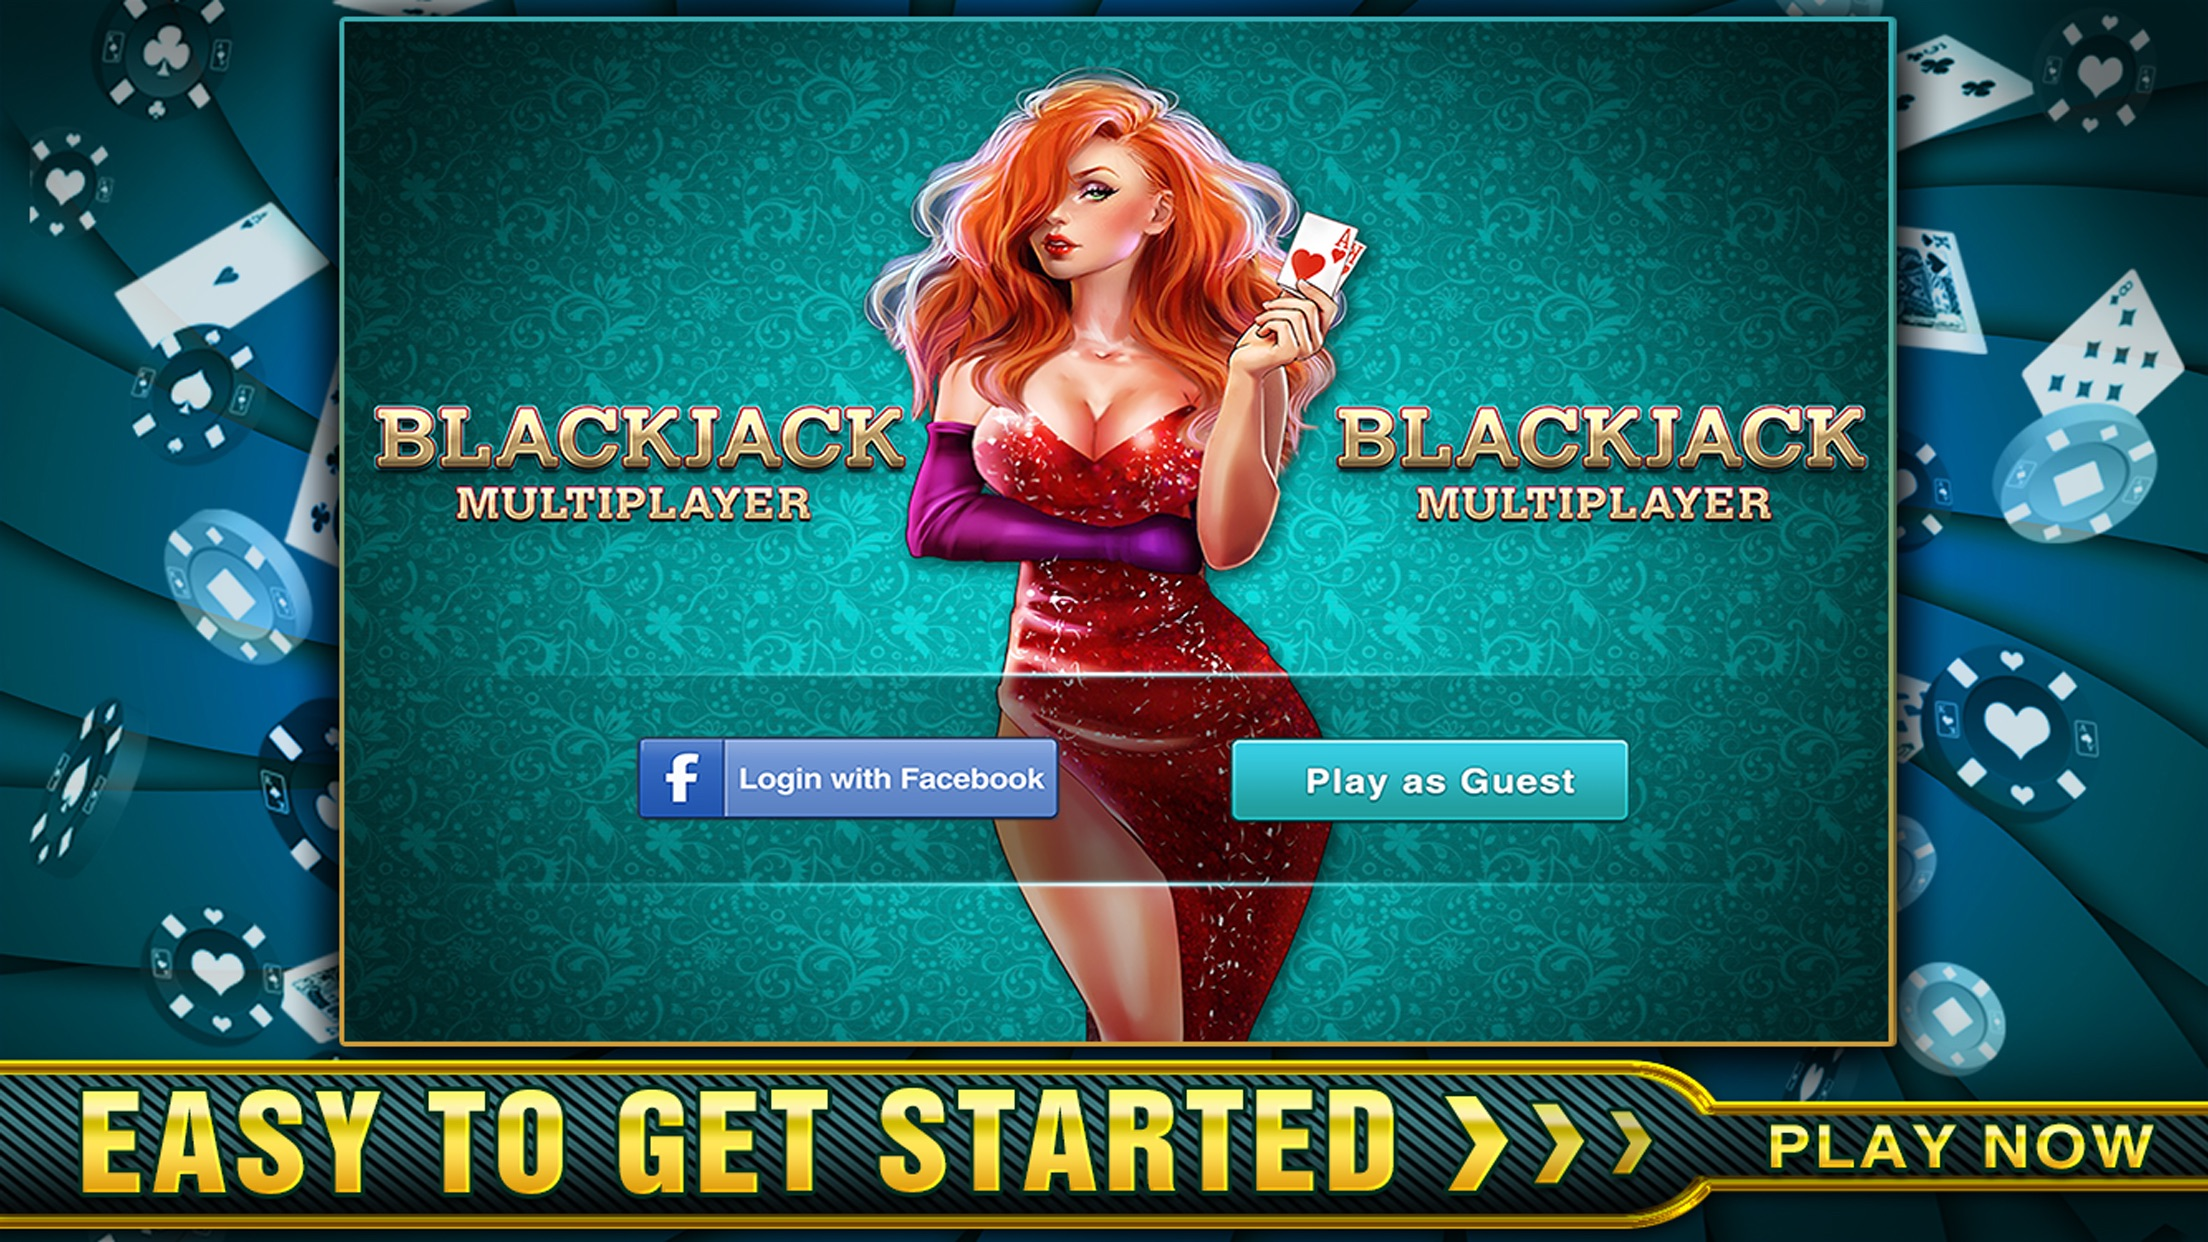 BlackJack Online - Just Like Vegas! Screenshot